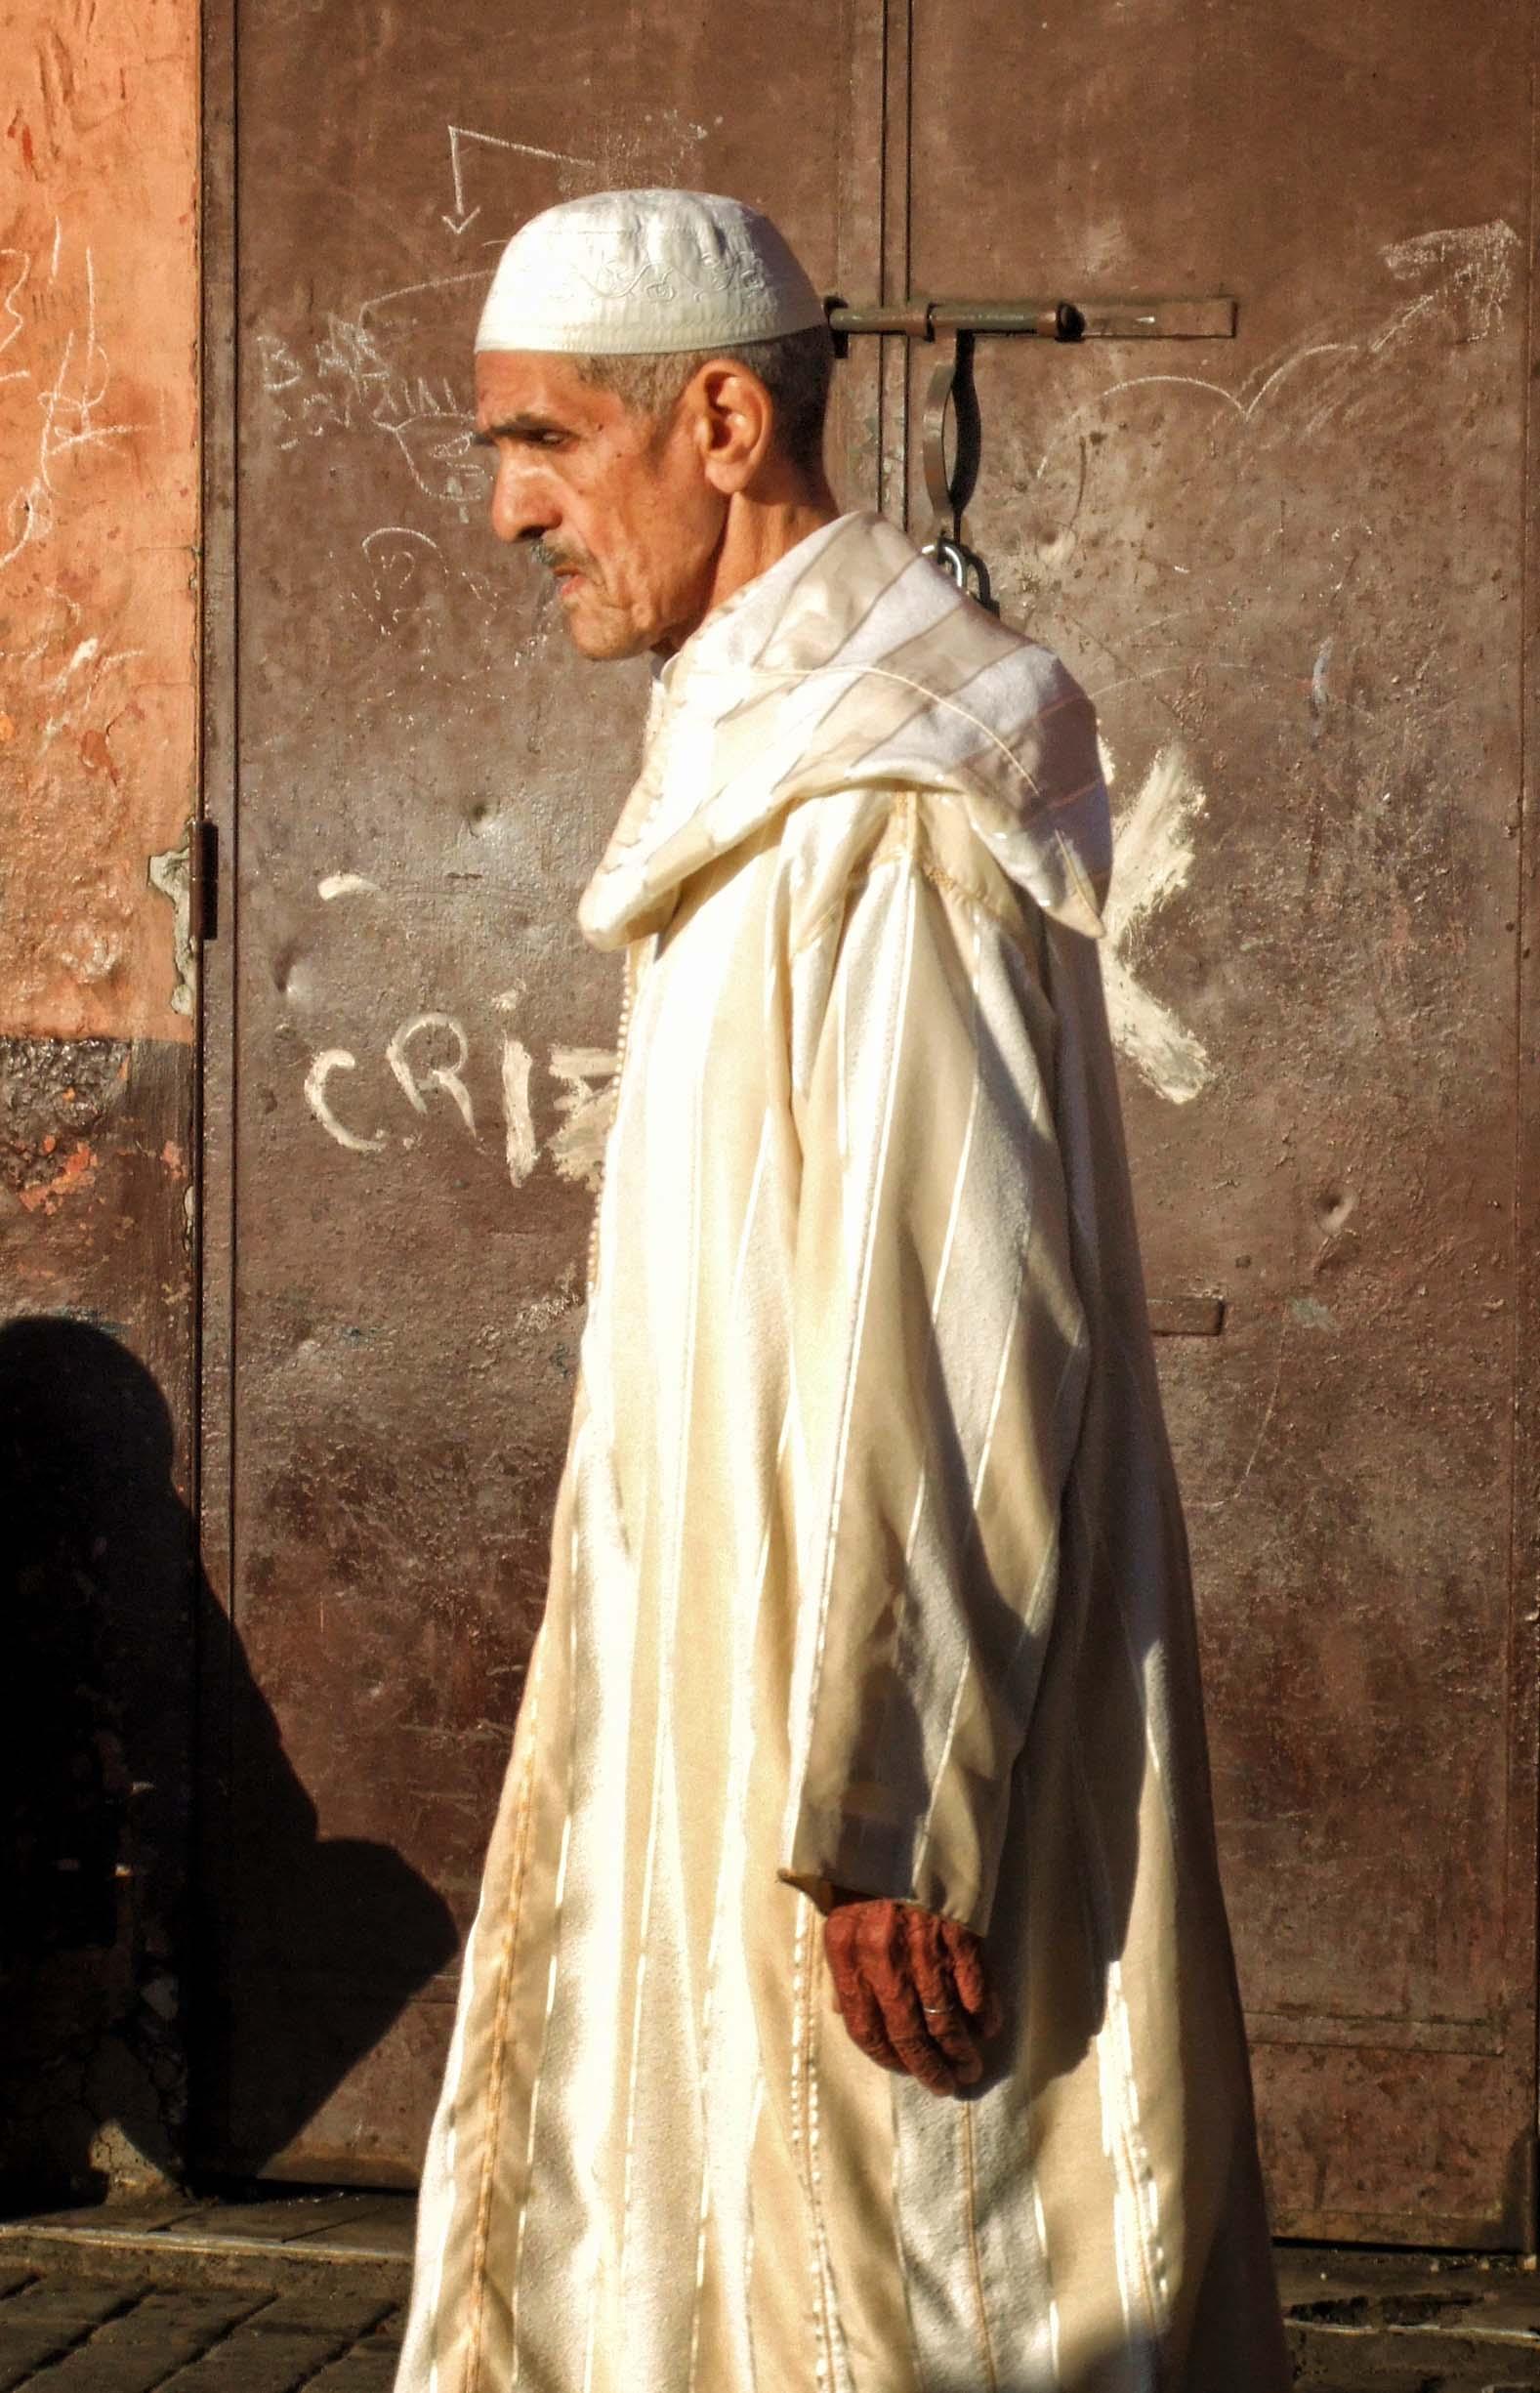 Man in white robe